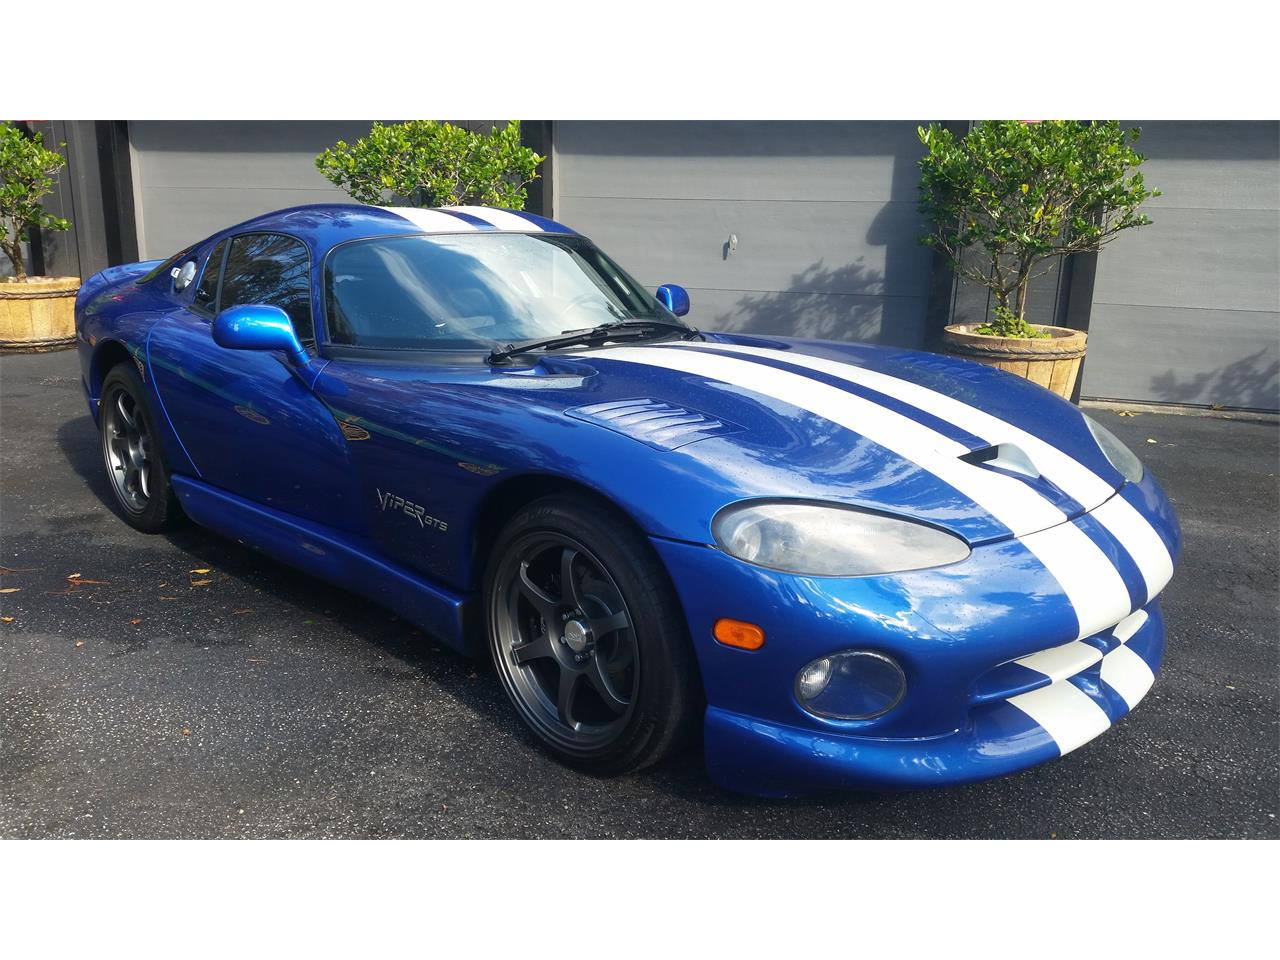 Viper Gts For Sale >> 1996 Dodge Viper For Sale Classiccars Com Cc 1174381